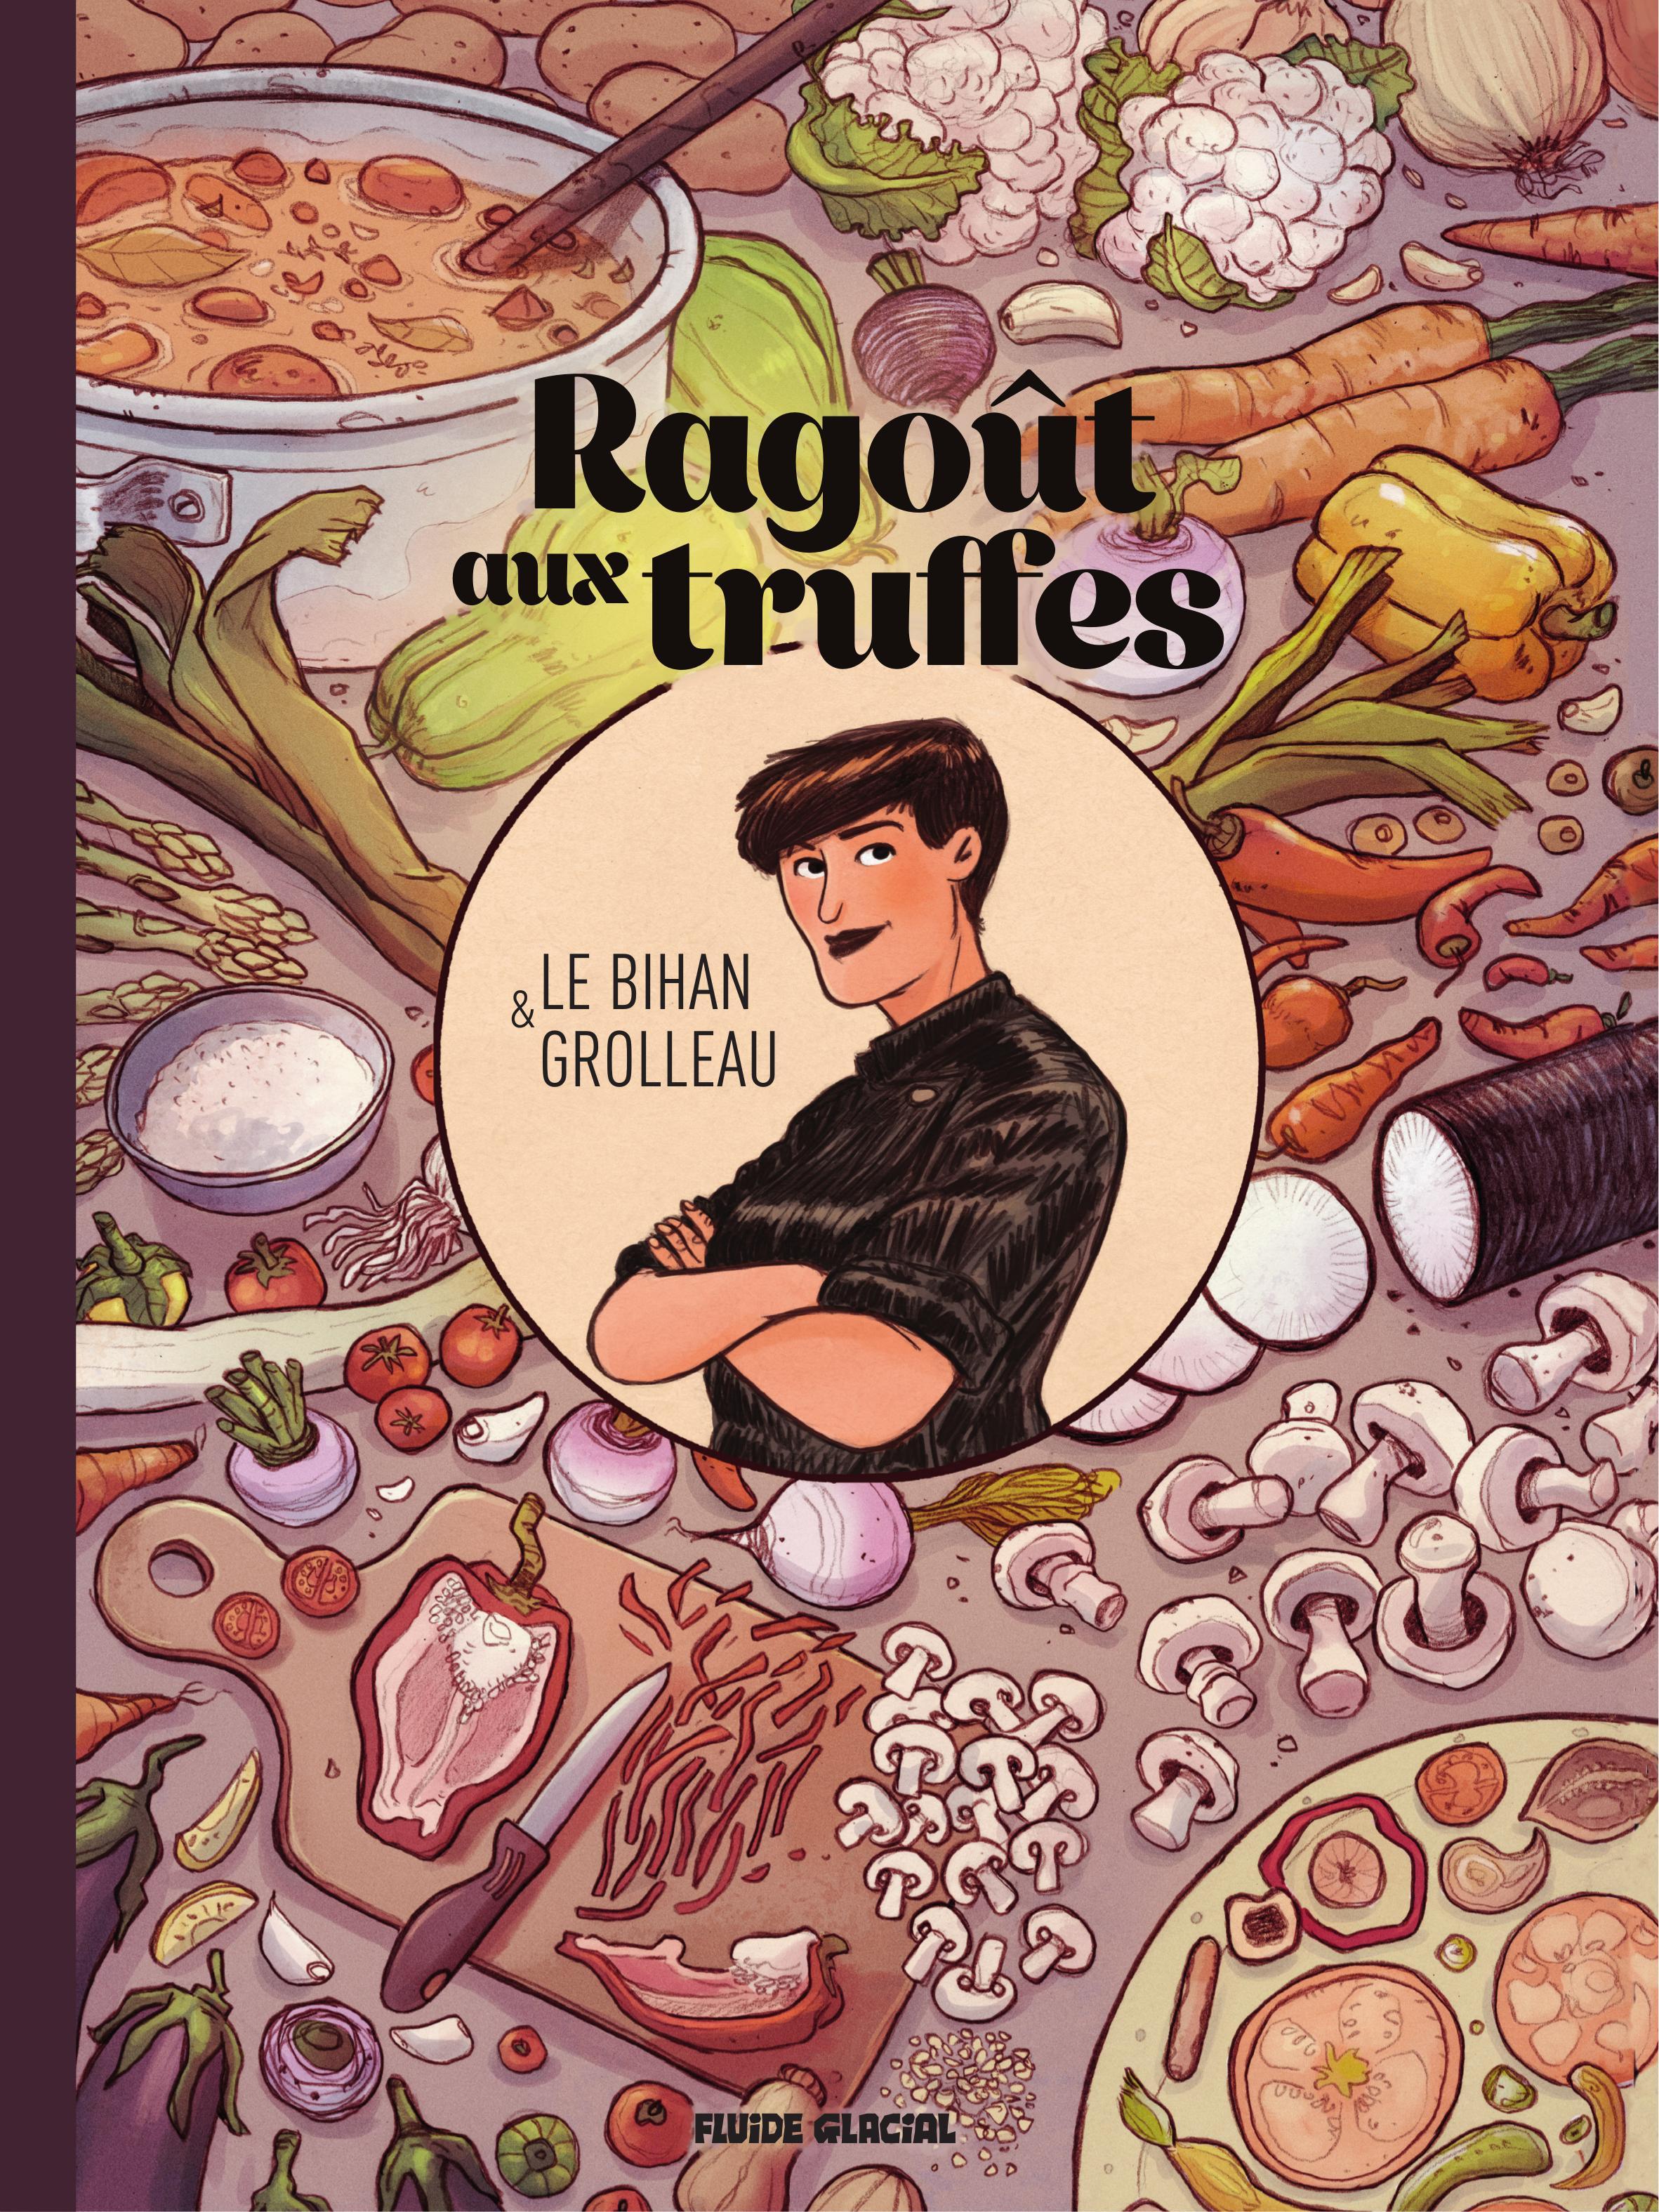 Ragoût aux truffes 1 - Ragoût de truffes